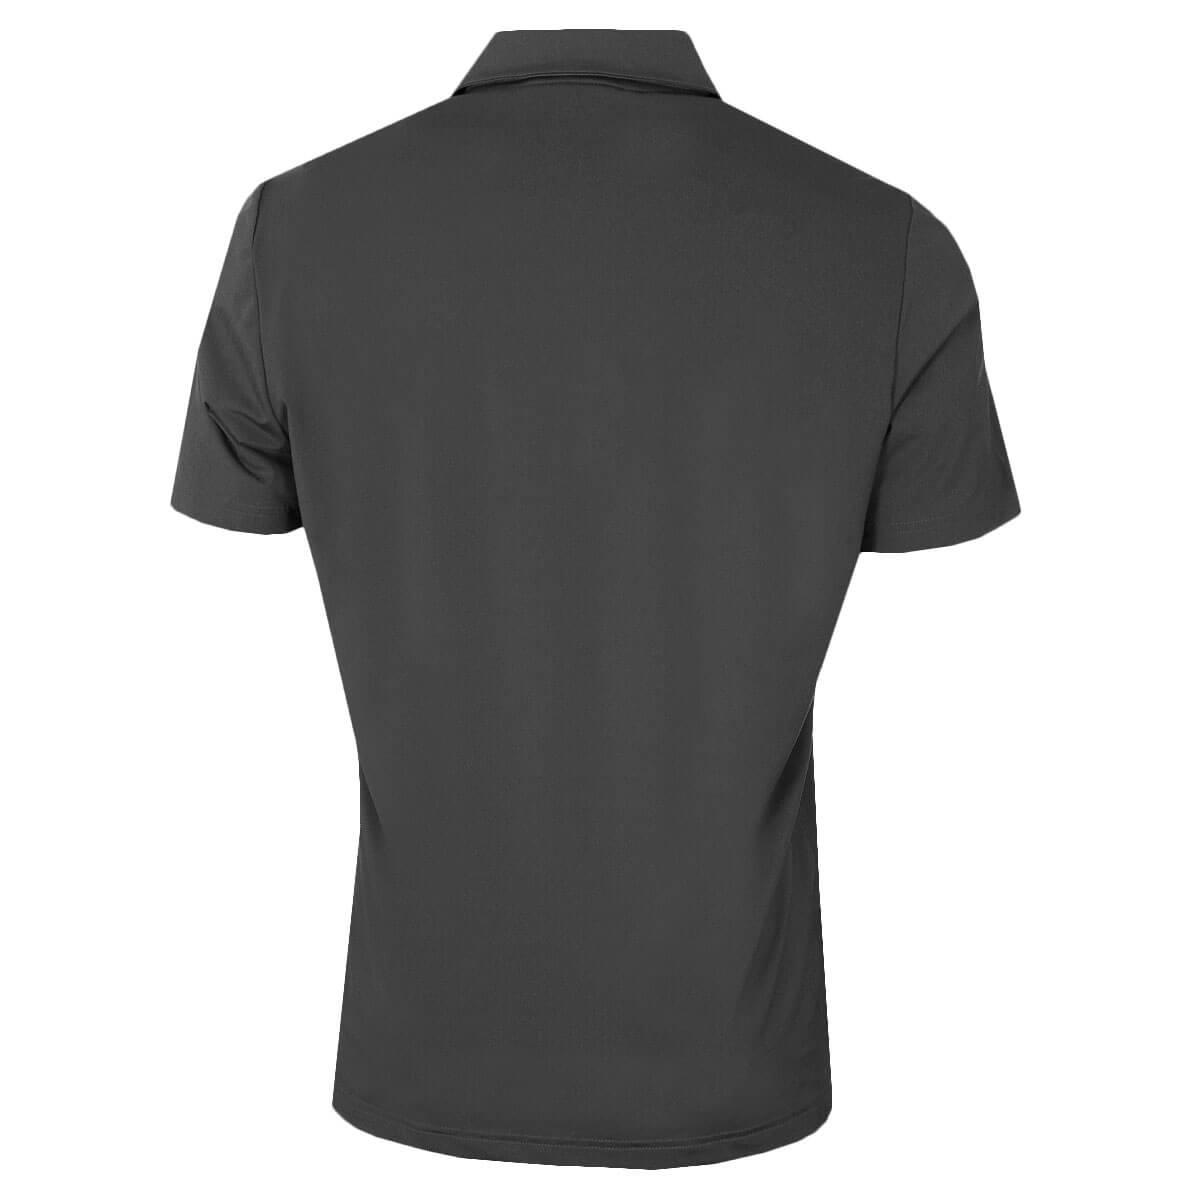 Adidas-Golf-Men-039-s-Ultimate-2-0-Solid-Crestable-Polo-Shirt thumbnail 15